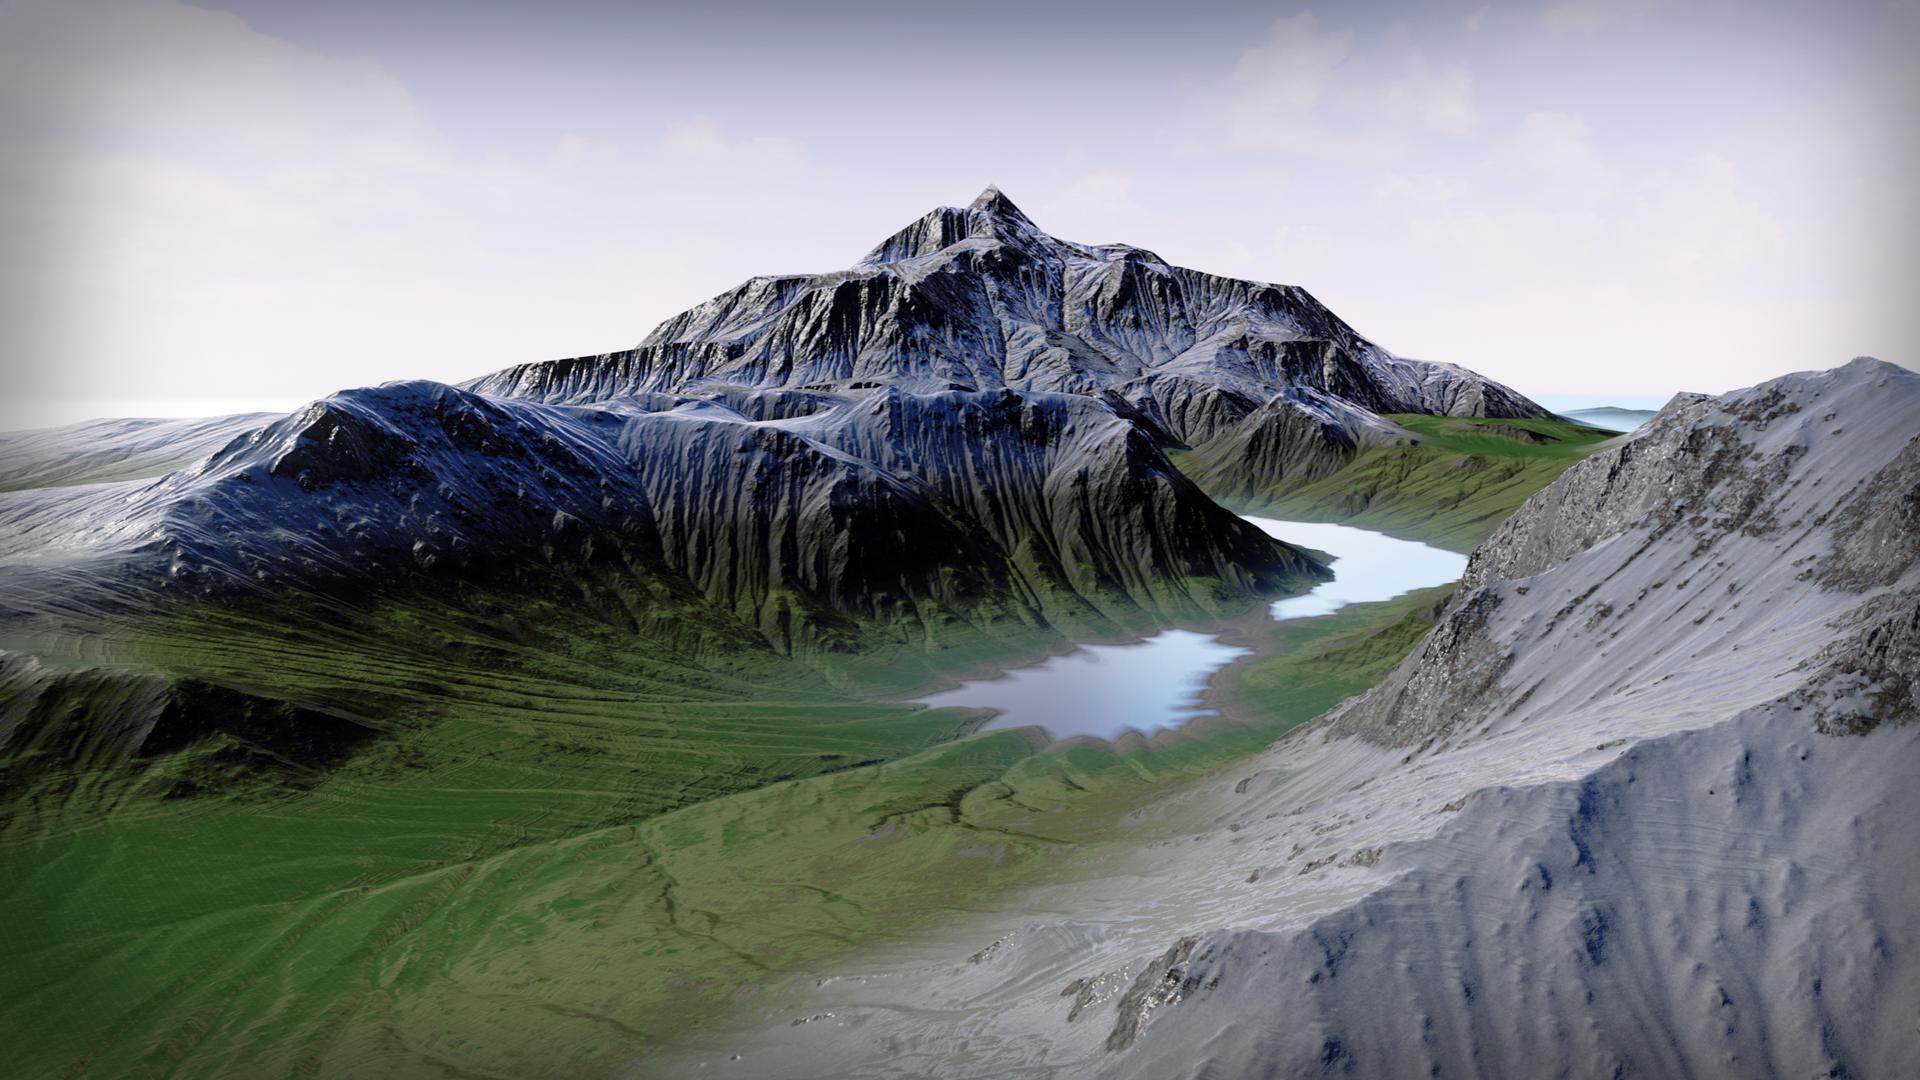 Auto Landscape MatAlpine (MaxStudiosDe)